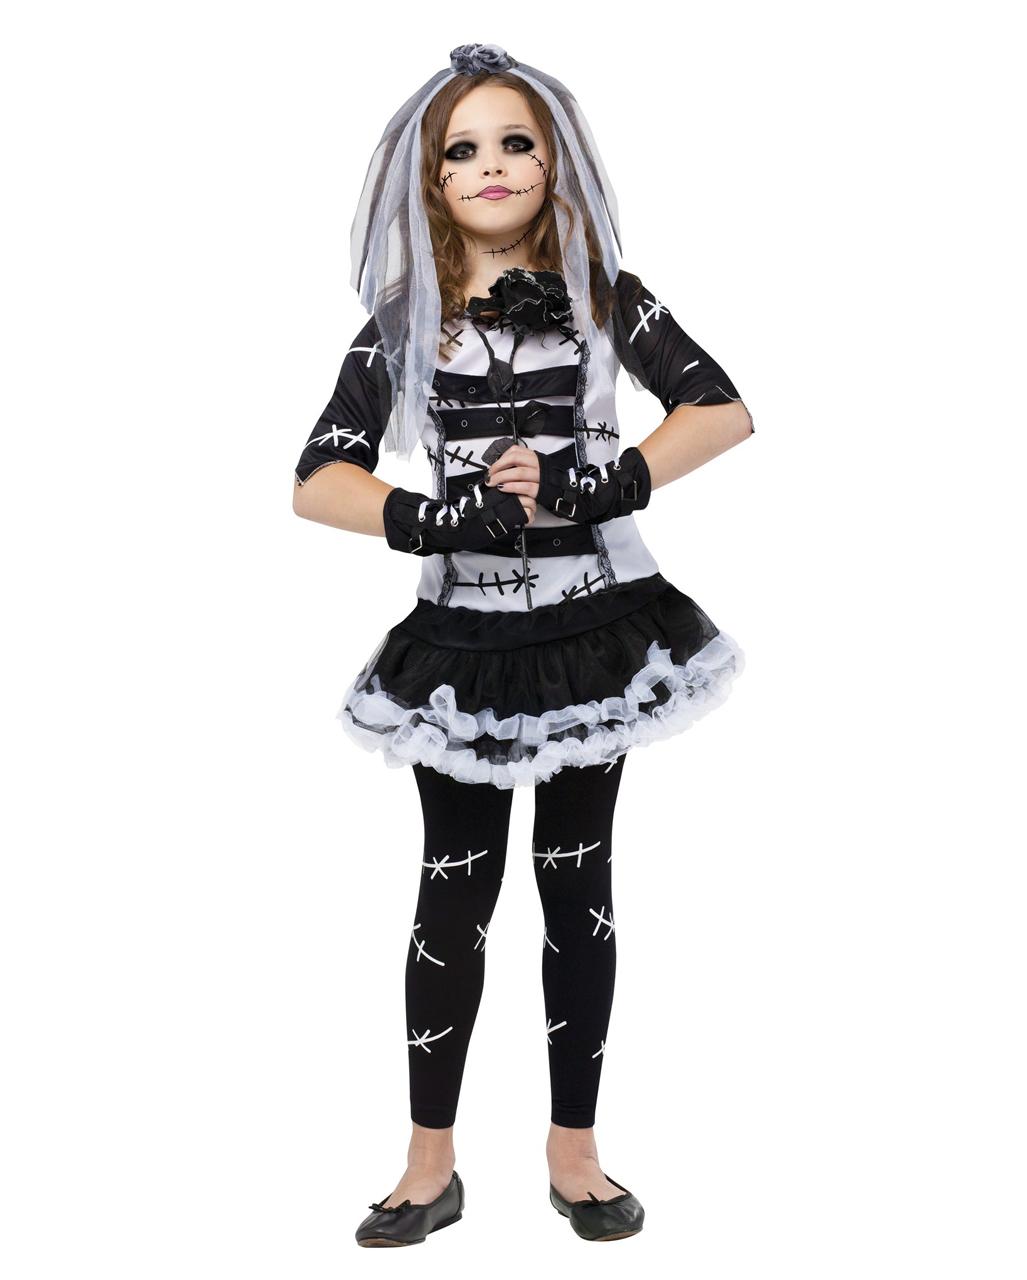 Monster Bride Child Costume ...  sc 1 st  Horror-Shop.com & Monster Bride Child Costume Zombie Bride Costume | horror-shop.com